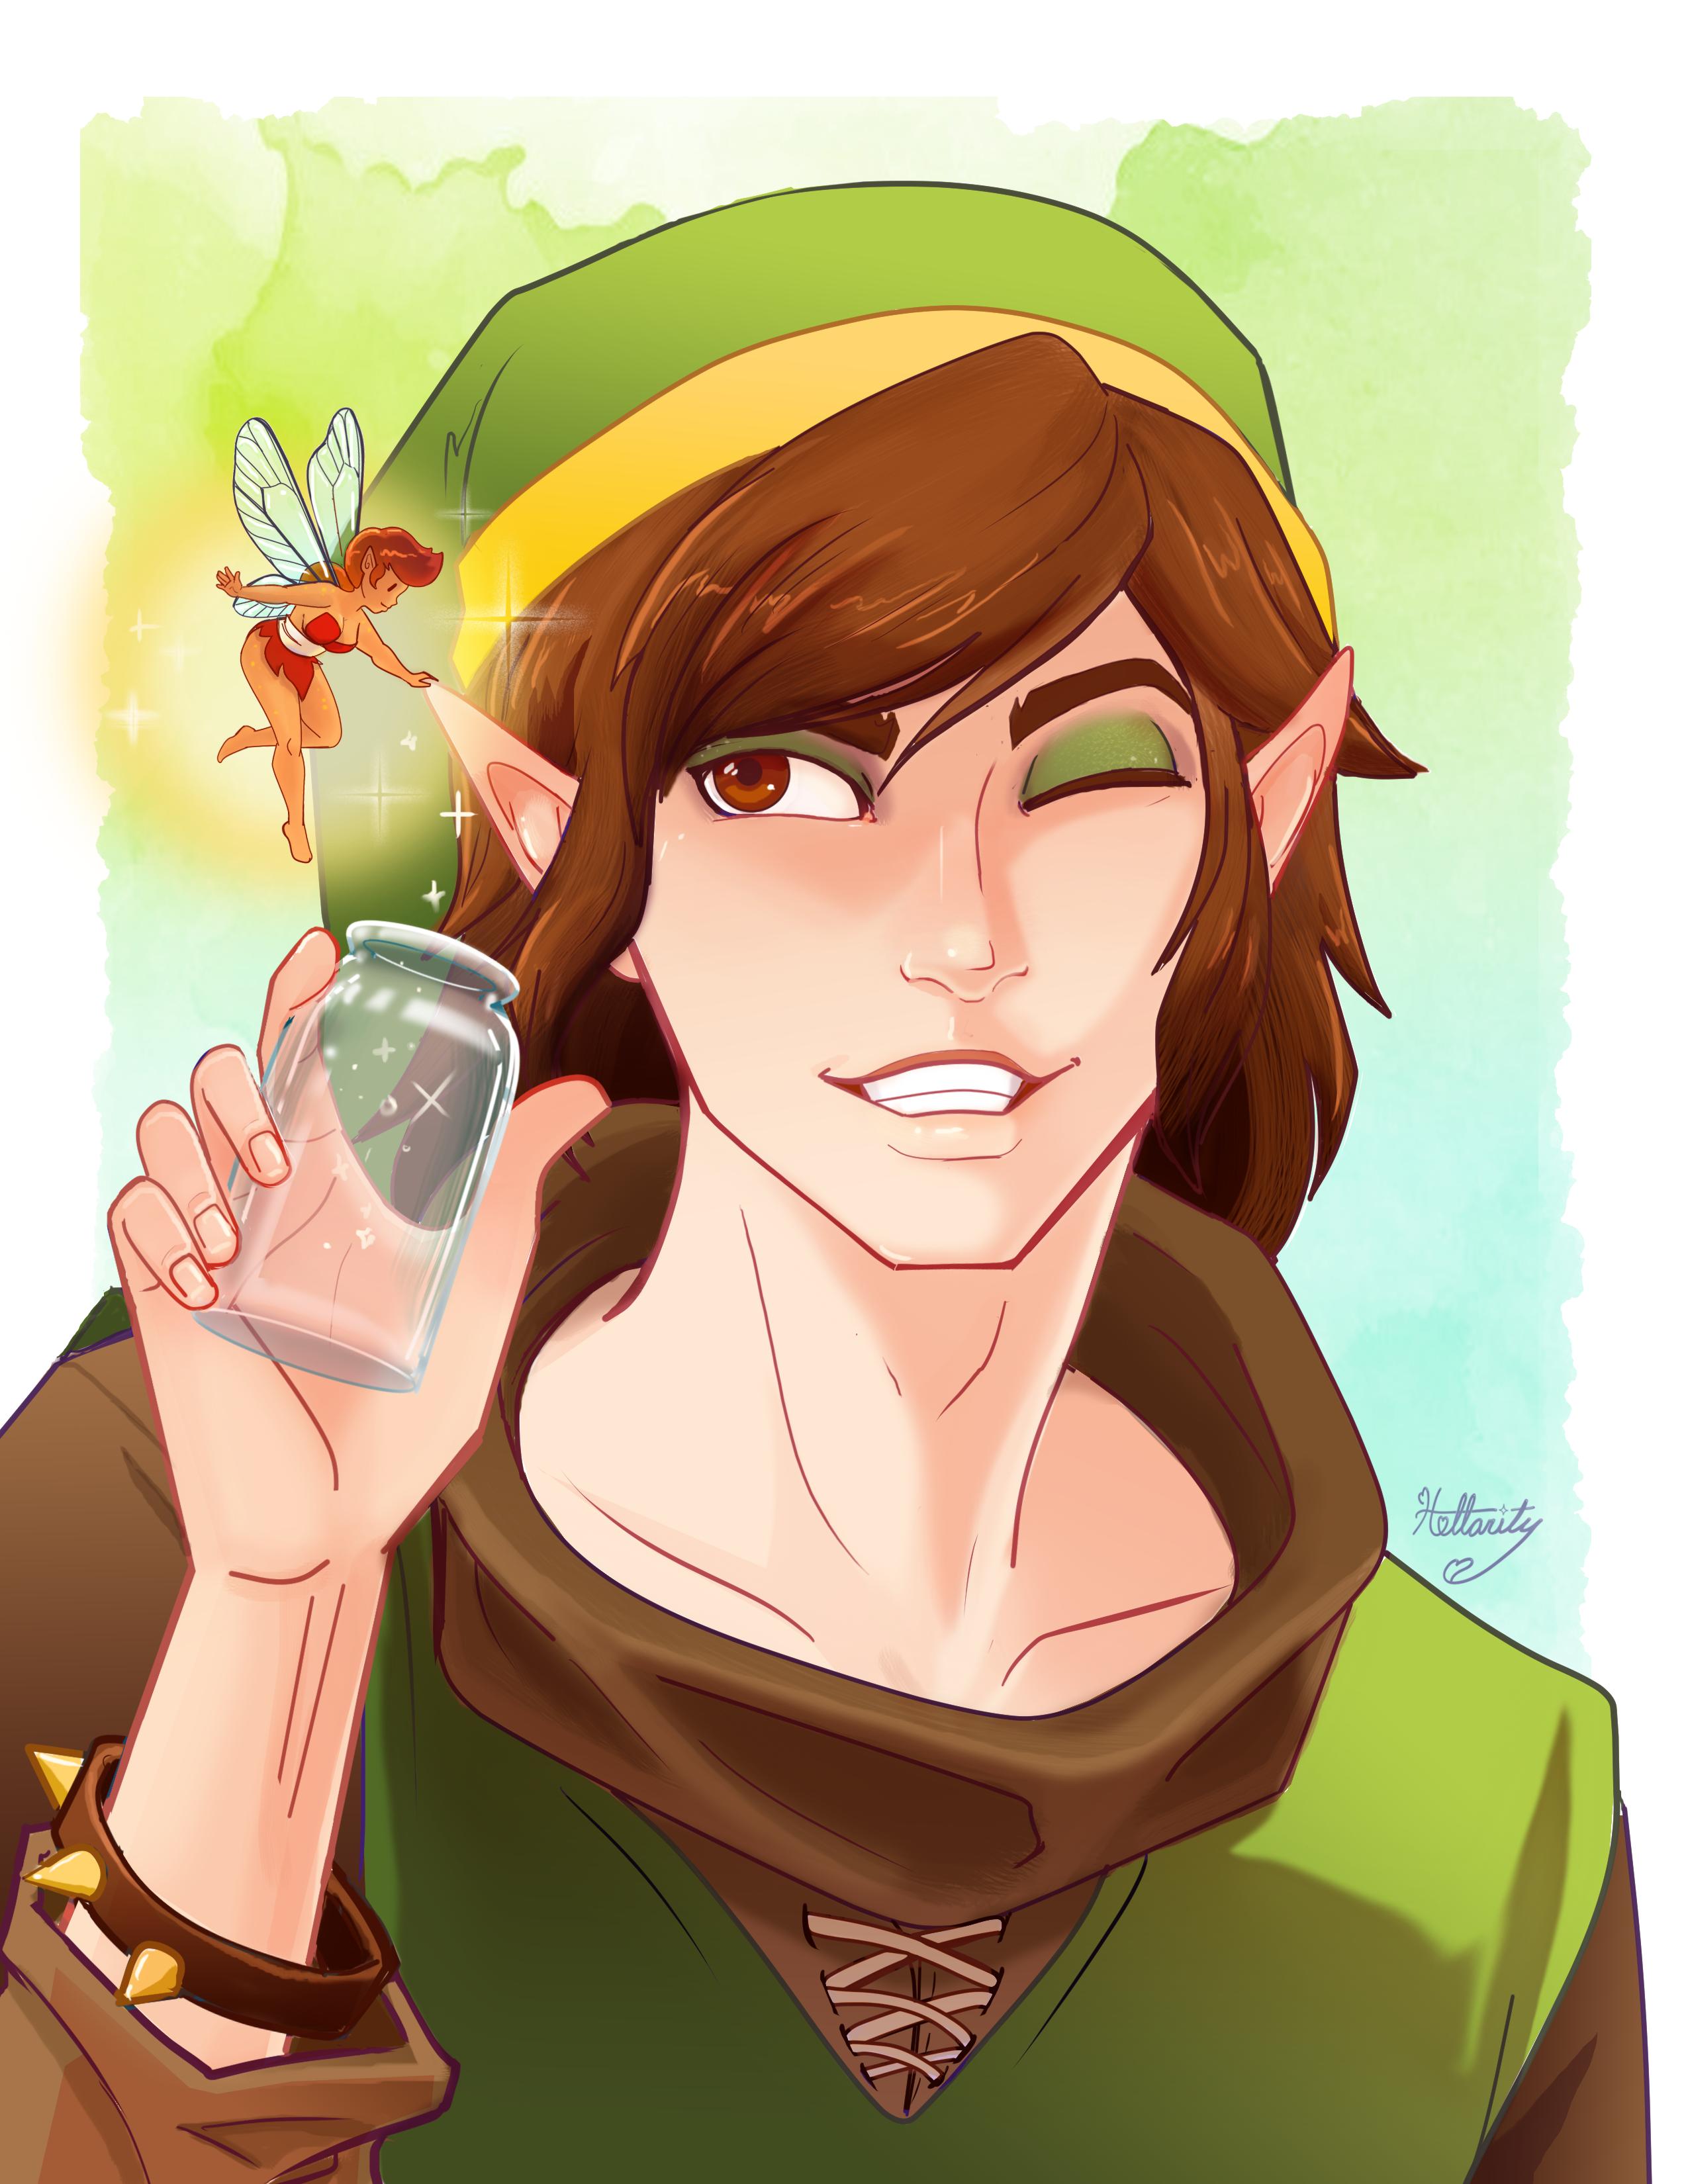 OG Link and Fairy